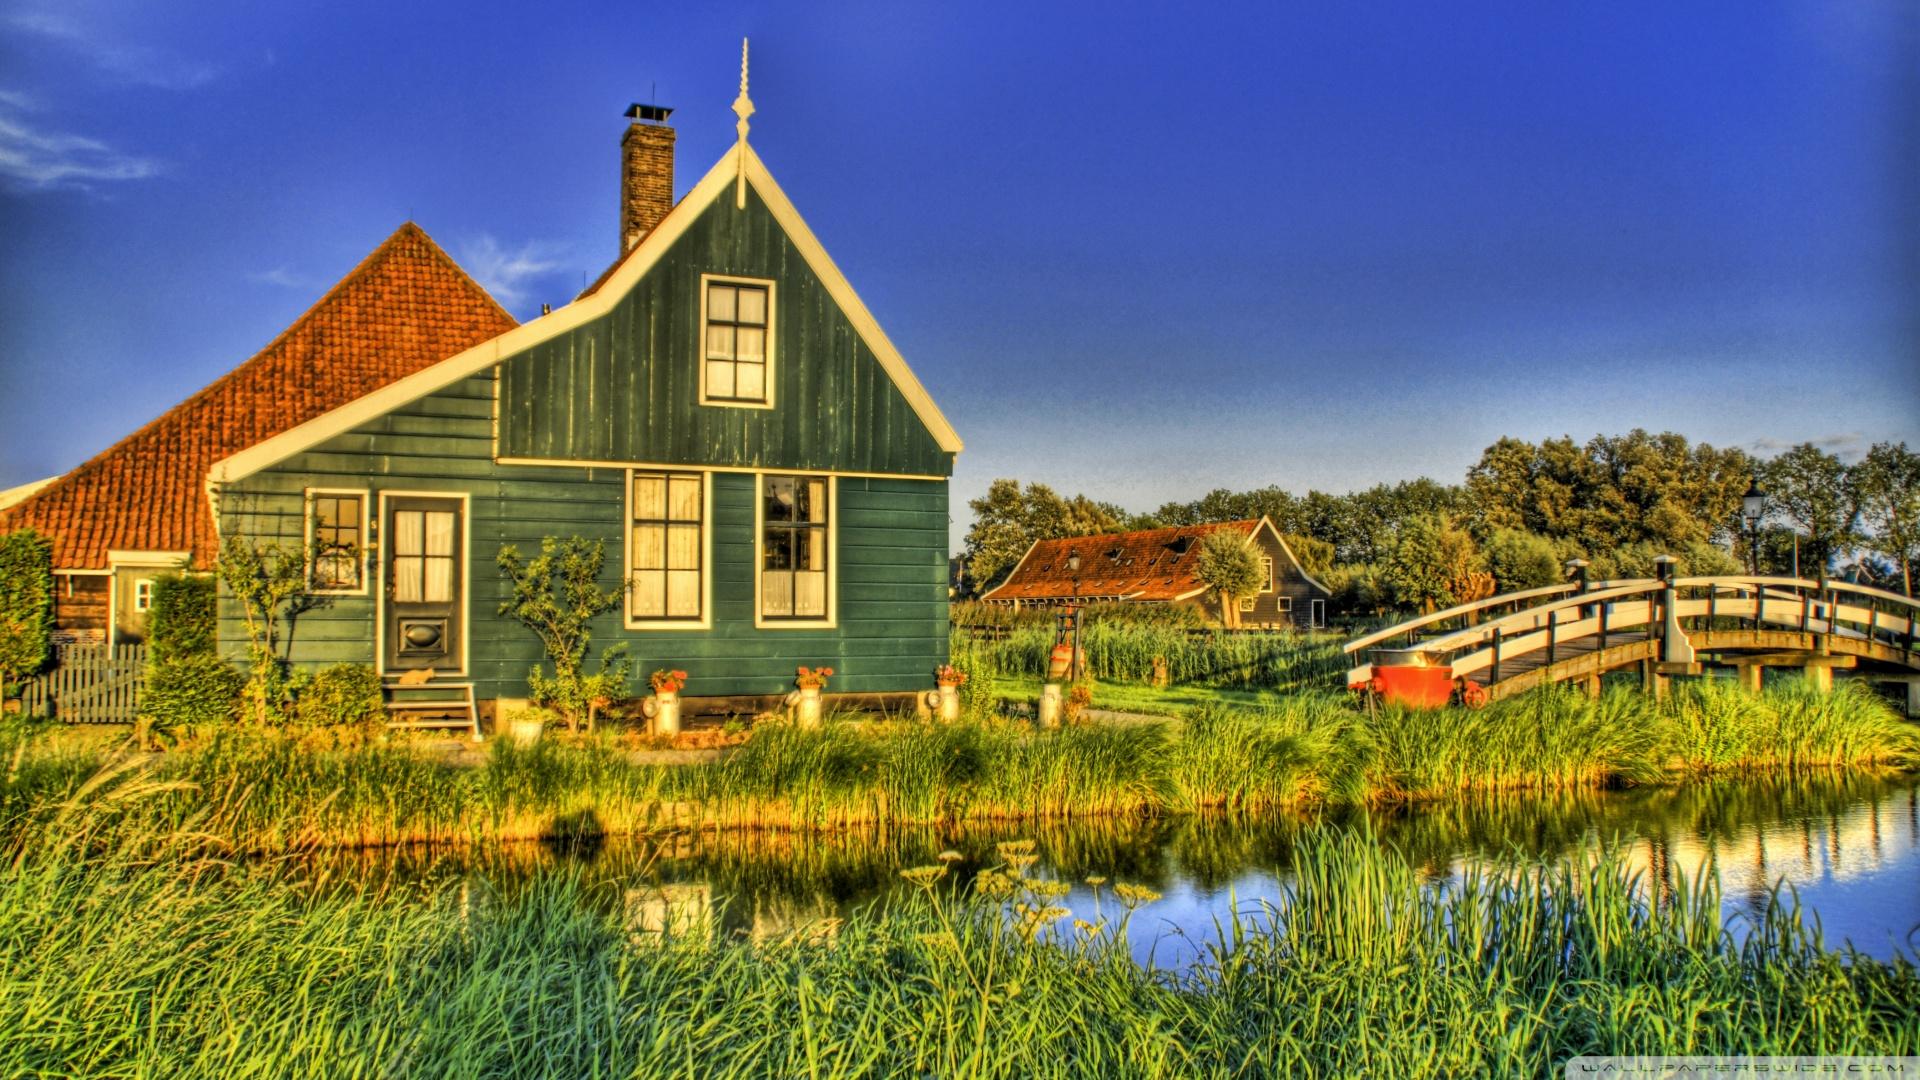 Holland Farmhouse Wallpaper 1920x1080 Holland Farmhouse 1920x1080